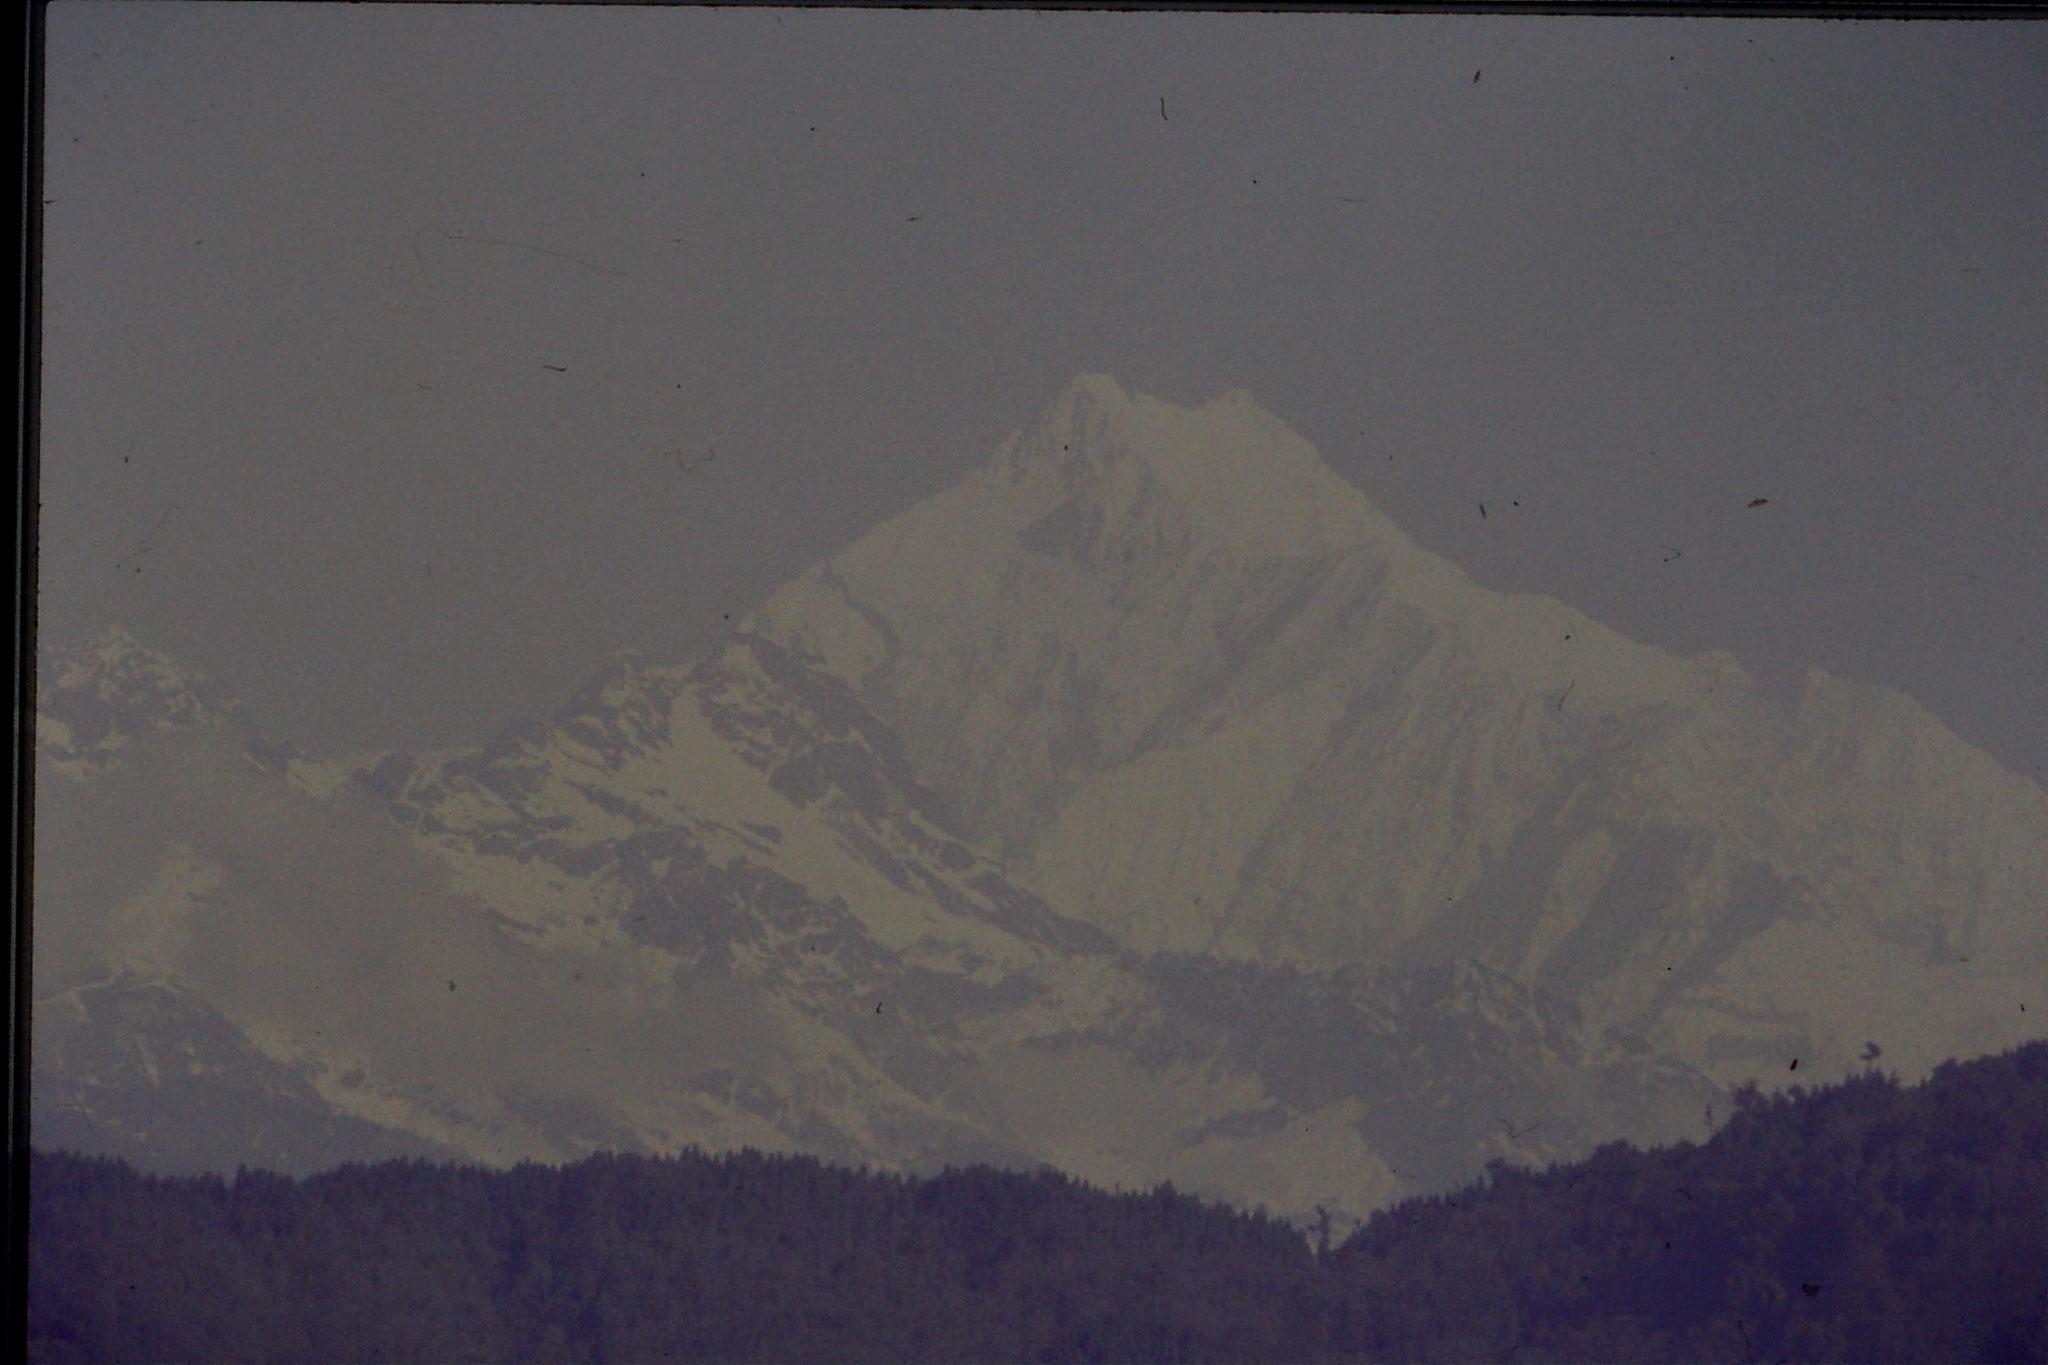 115/15: 25/4/1990 Gangtok - Kanchenjunga